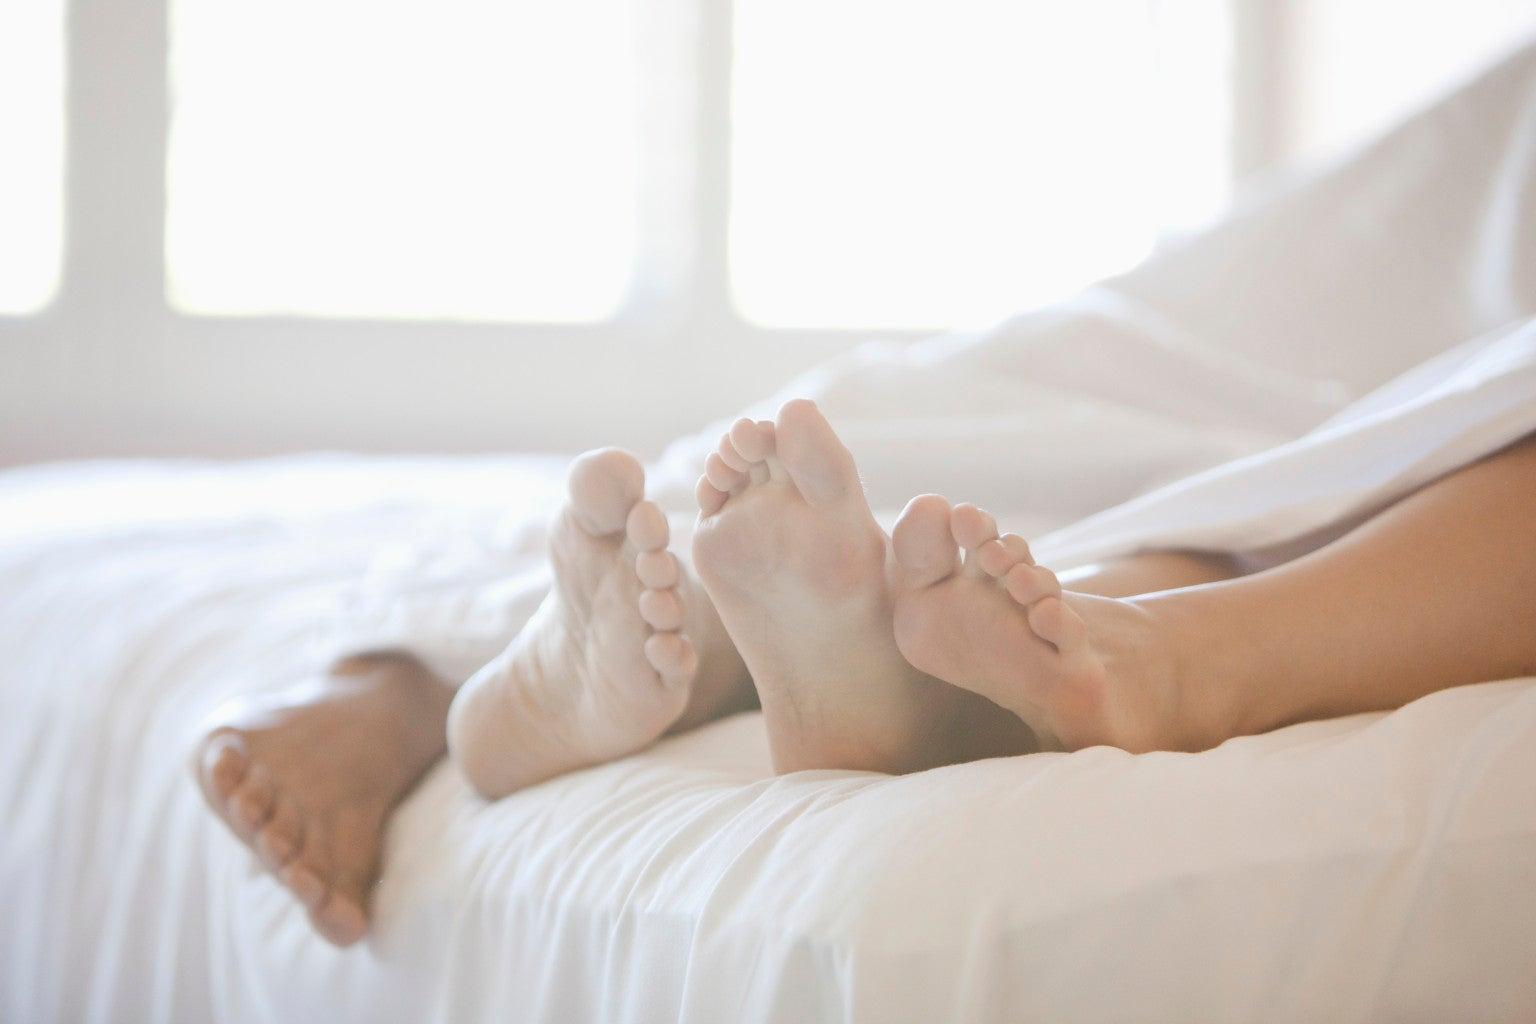 Estudio revela la hora perfecta para tener intimidad con tu pareja